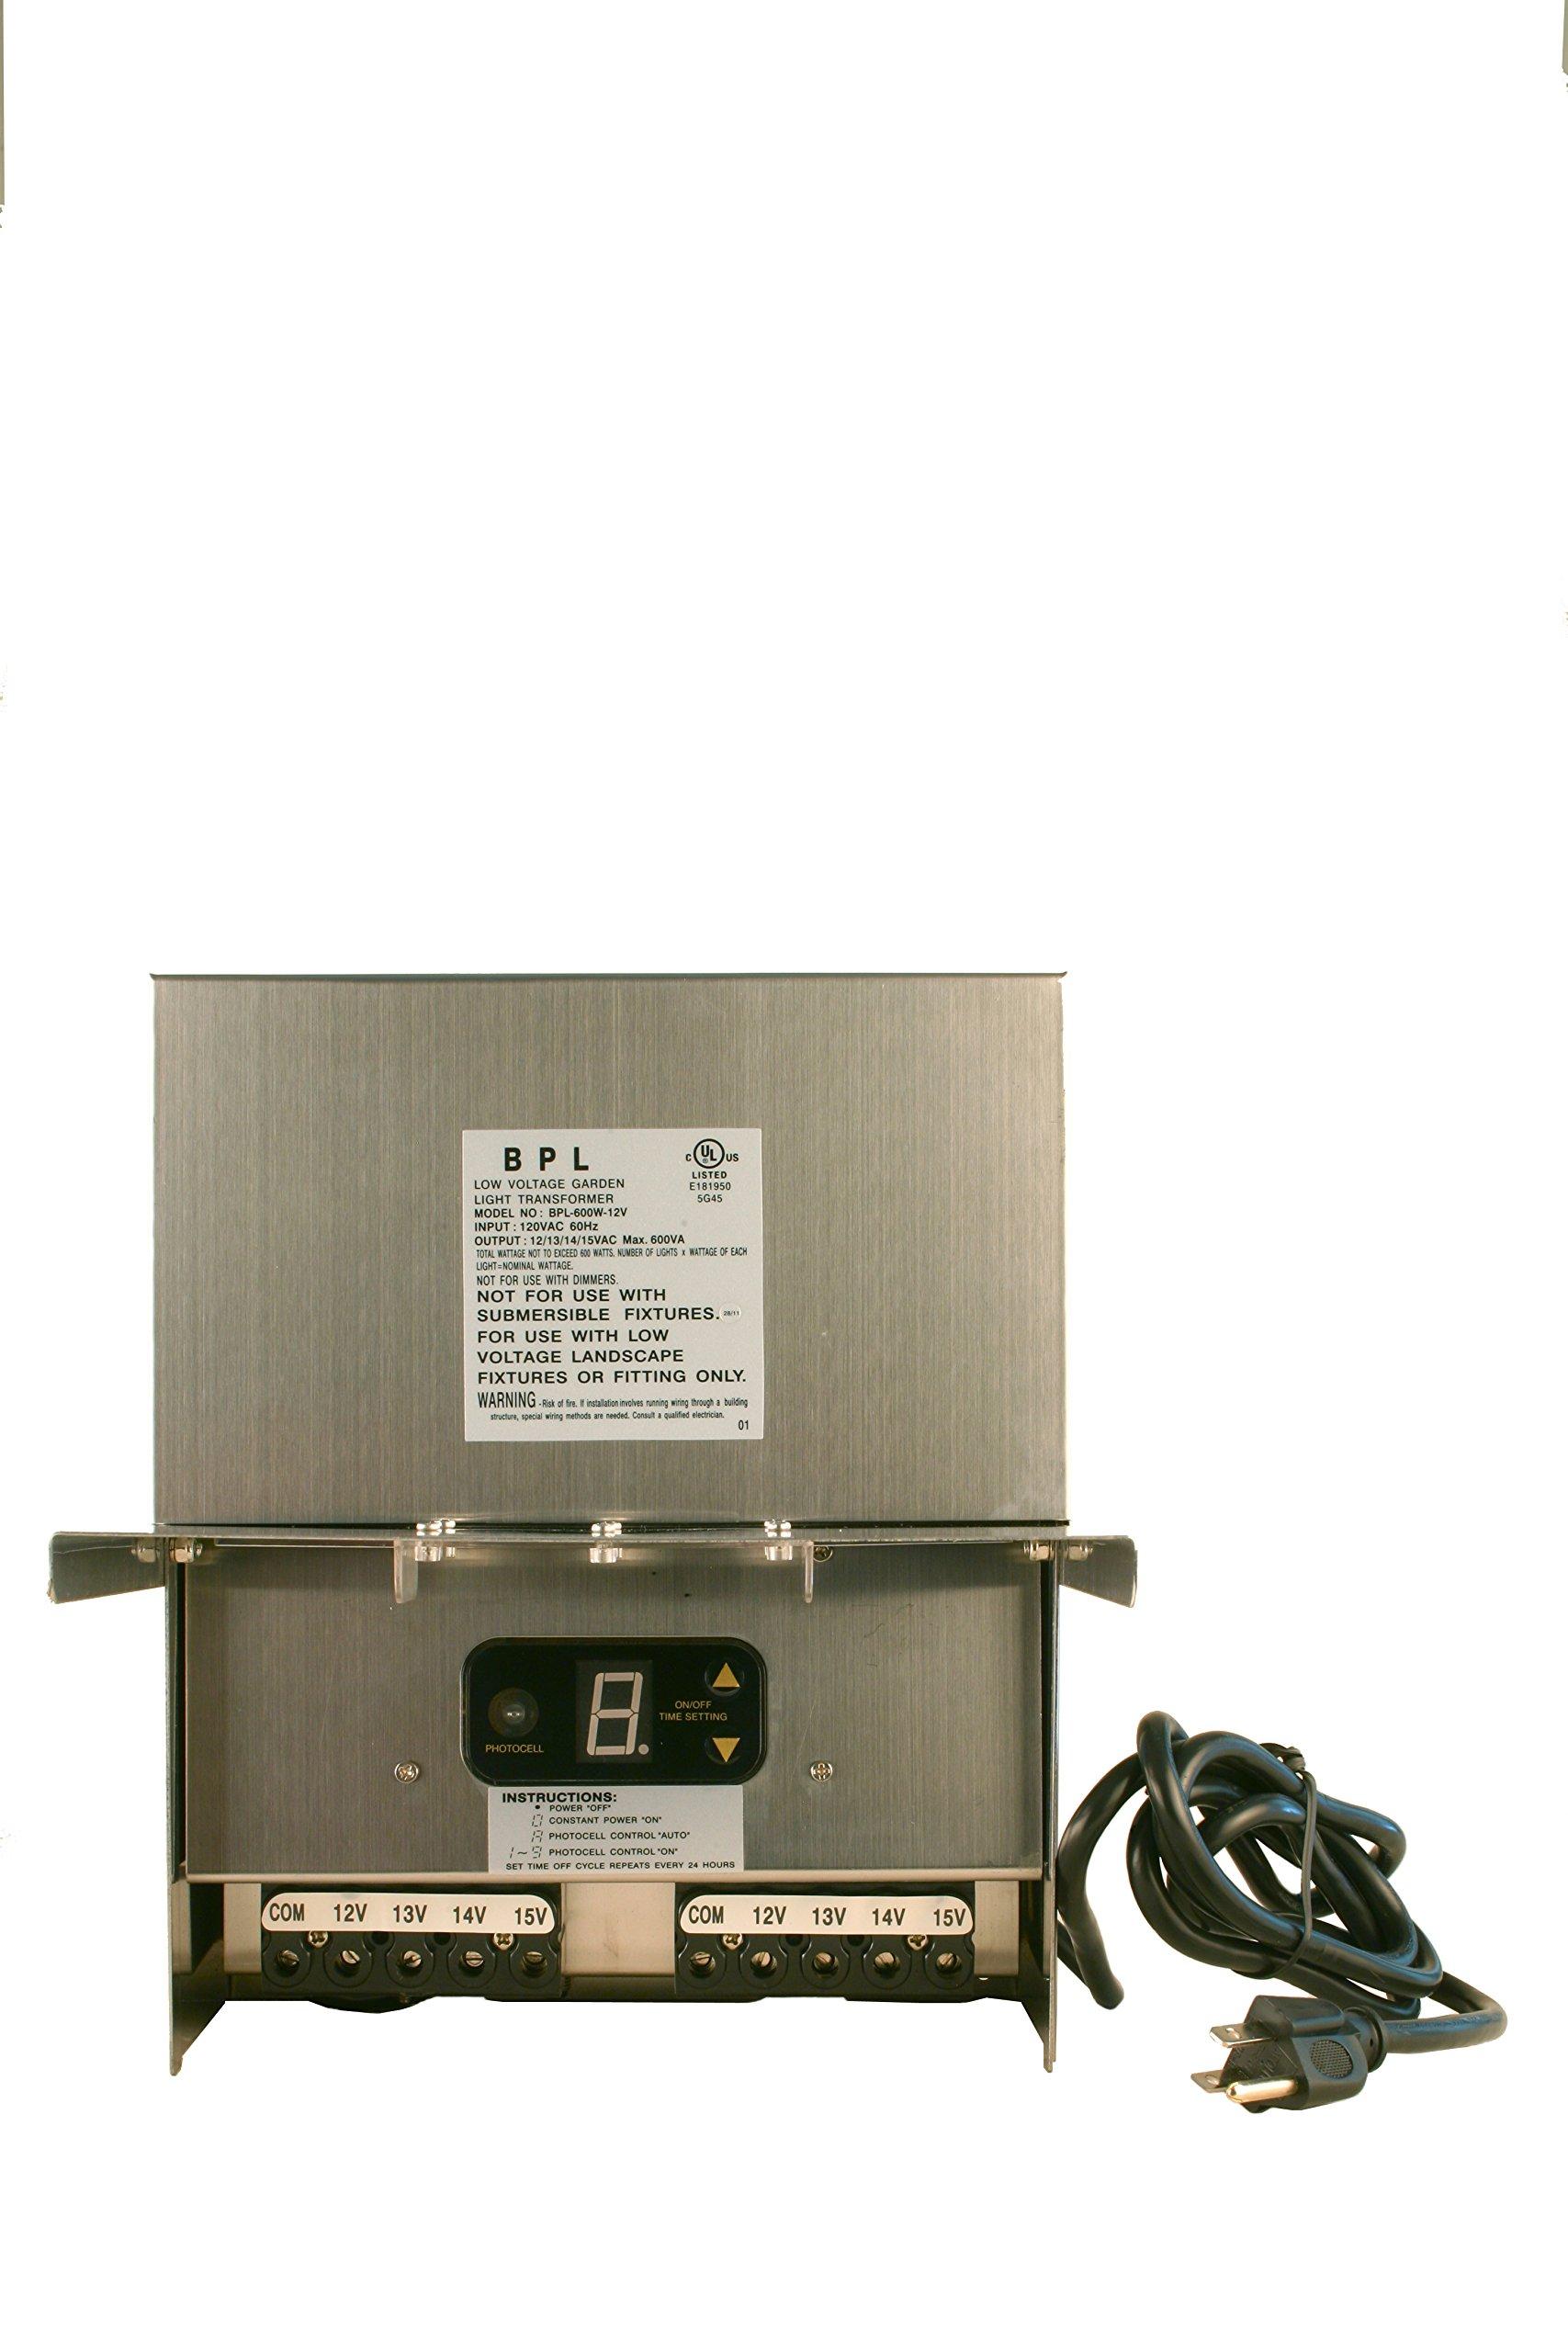 600W Stainless Steel Low Voltage Landscape Light Transformer 12V by Best Pro Lighting